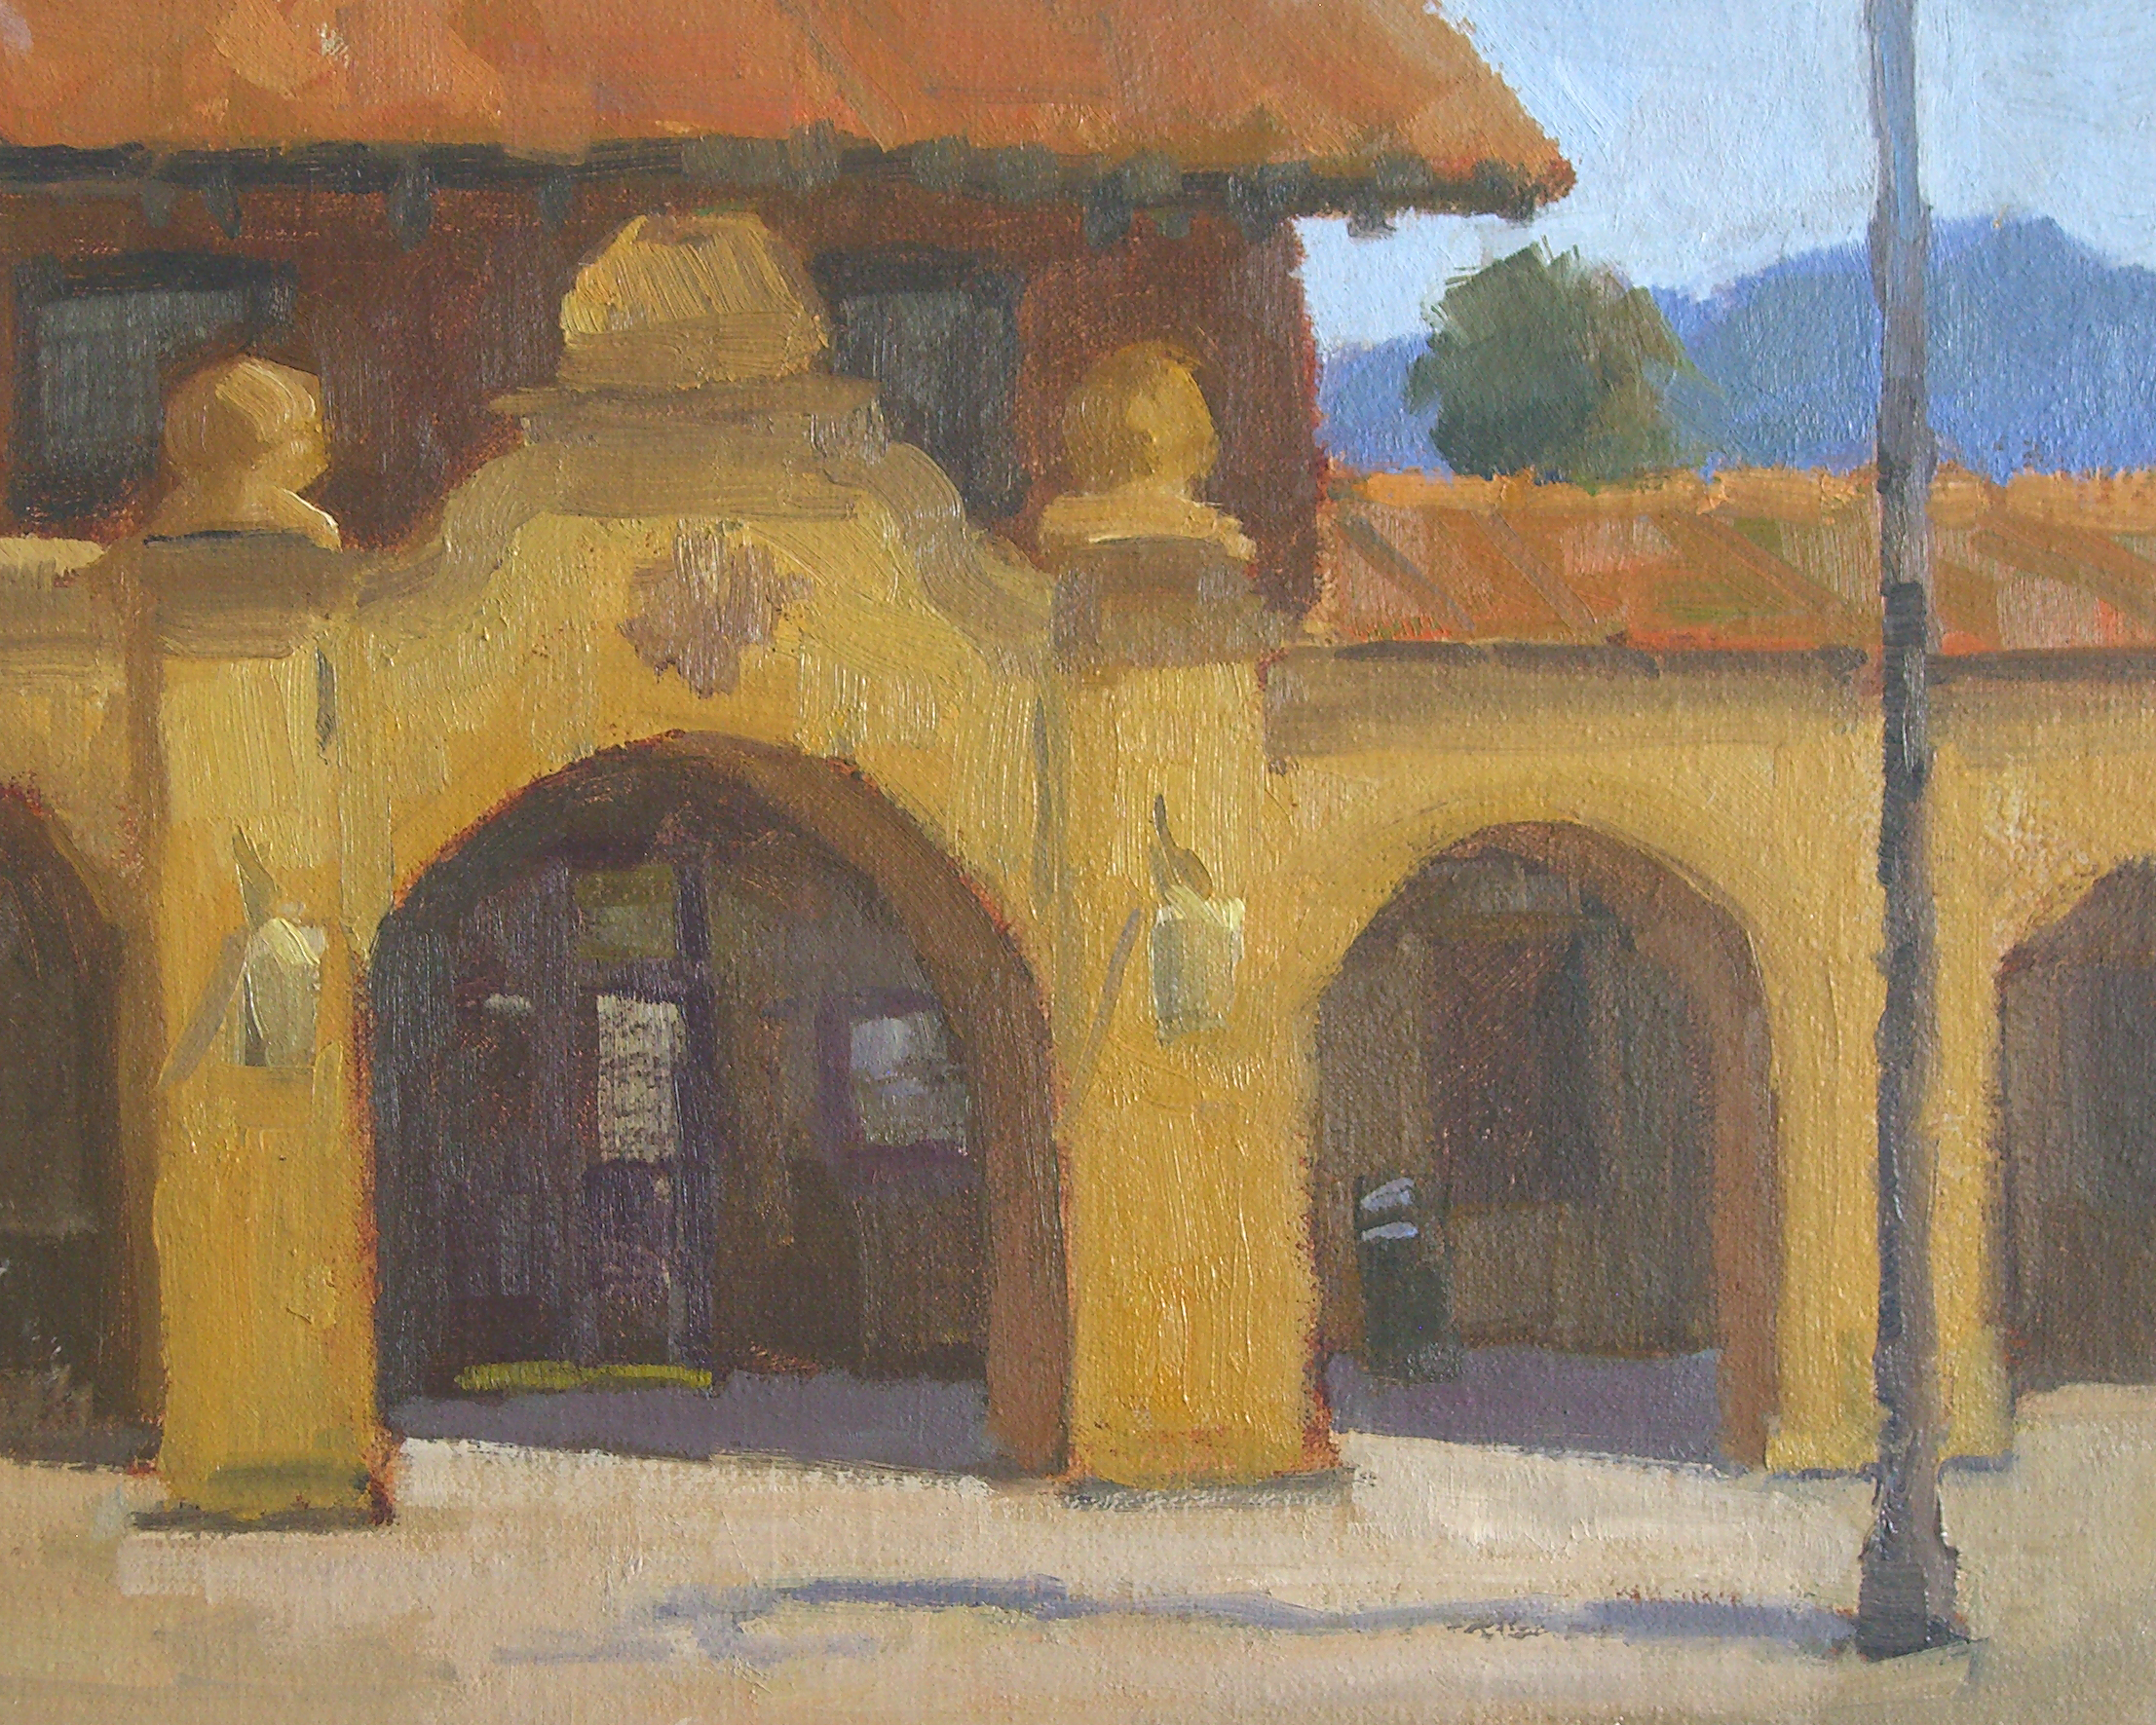 Railway Station, oil, 8x10